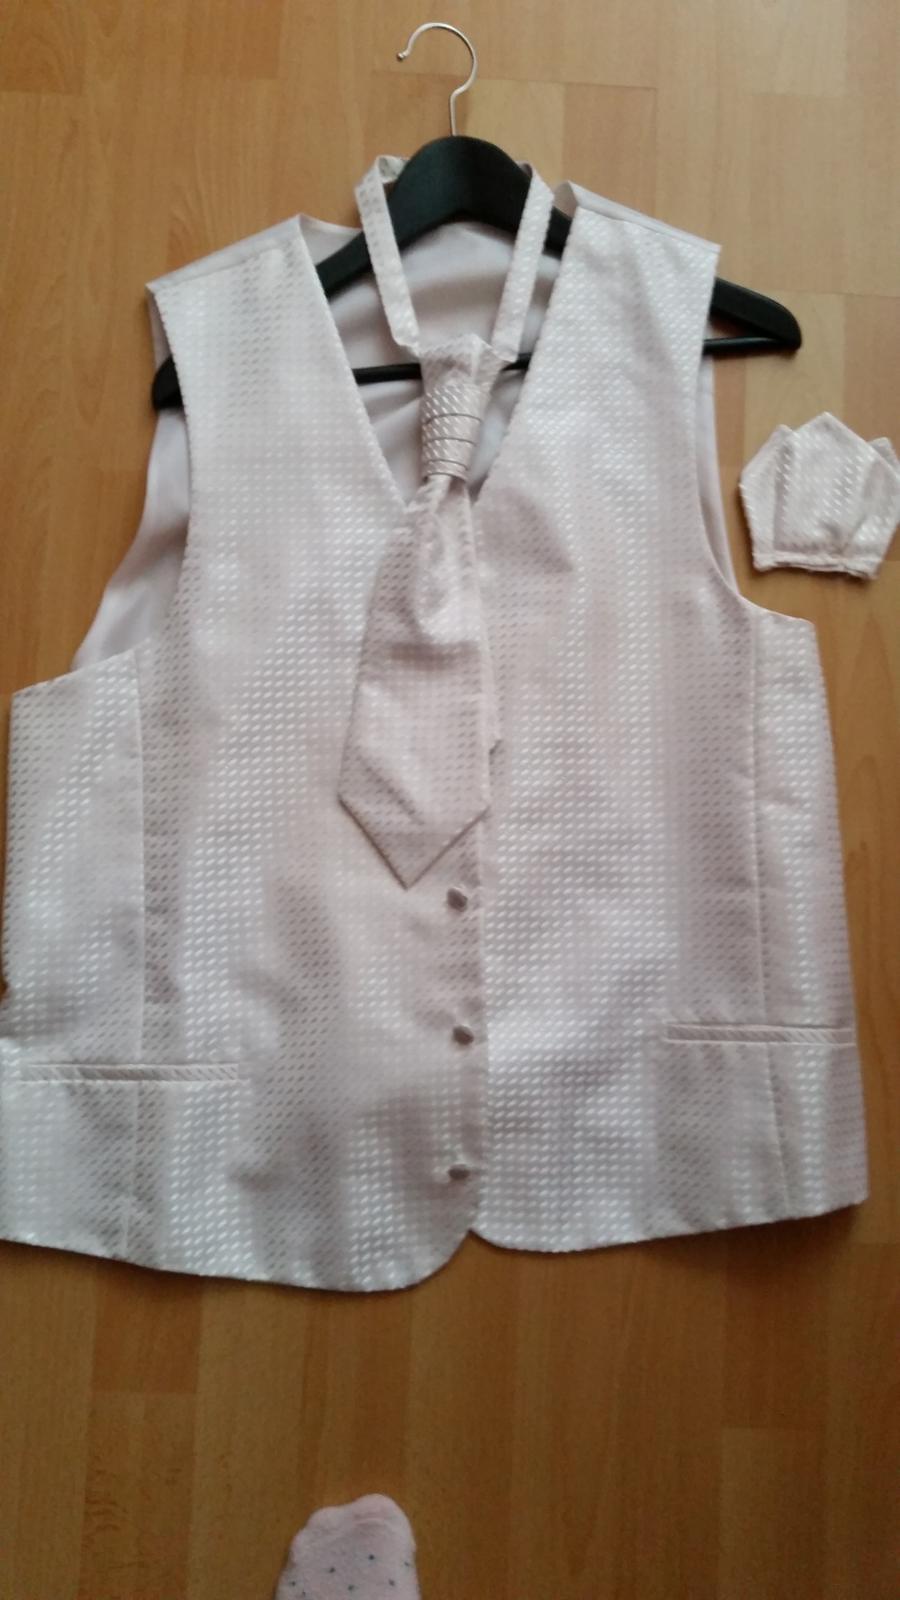 Svadobna vesta +kravata+vreckovka pre zenicha - Obrázok č. 2